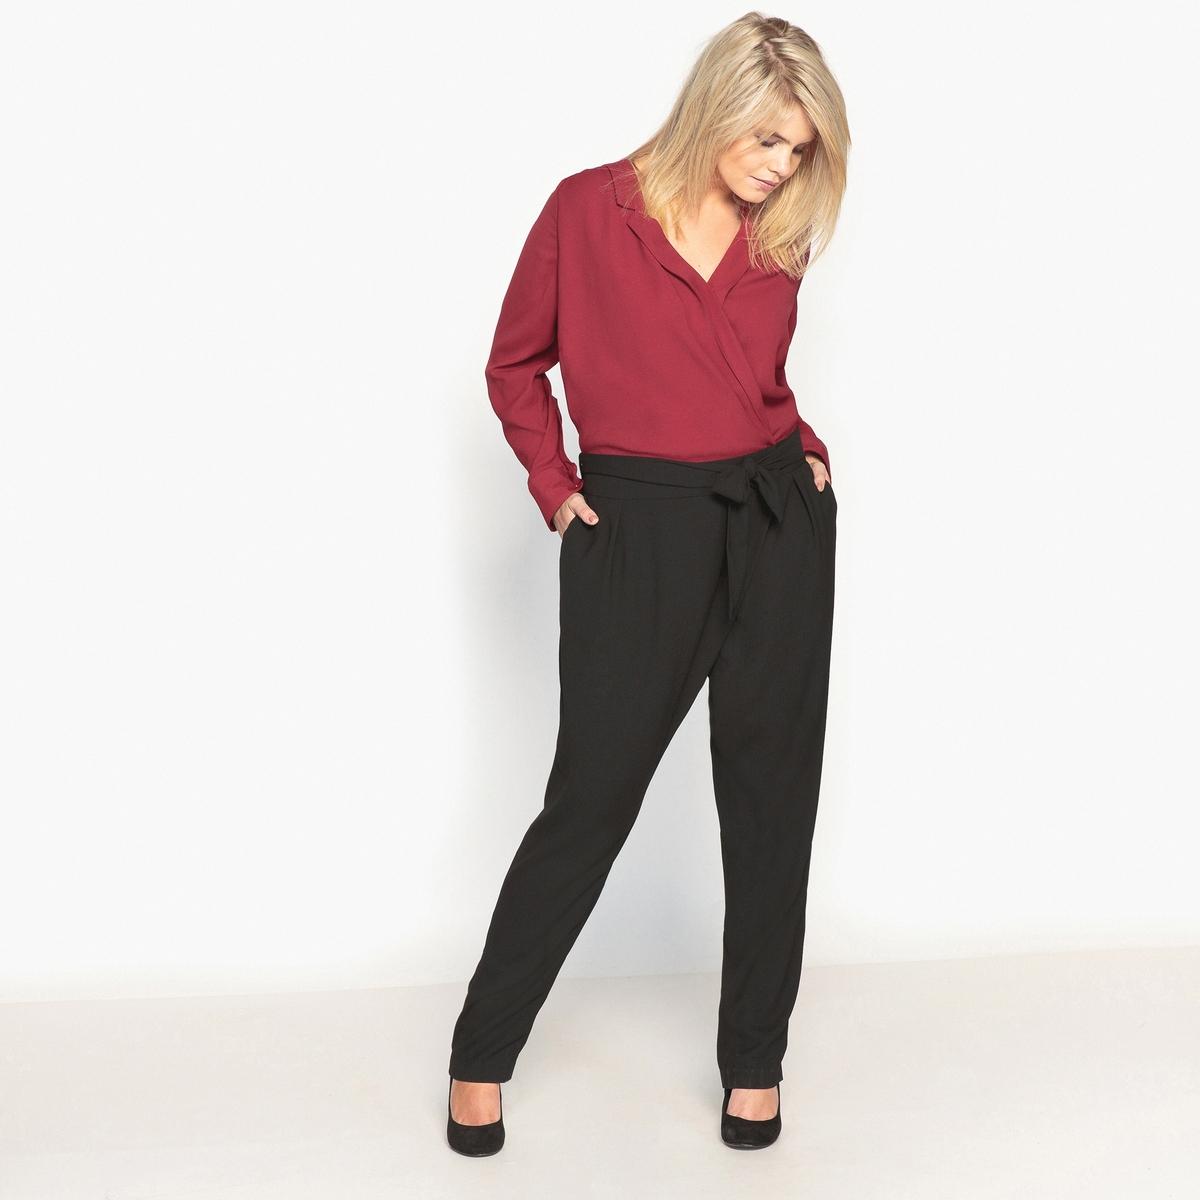 Комбинезон с брюками двухцветный комбинезон с брюками stuart